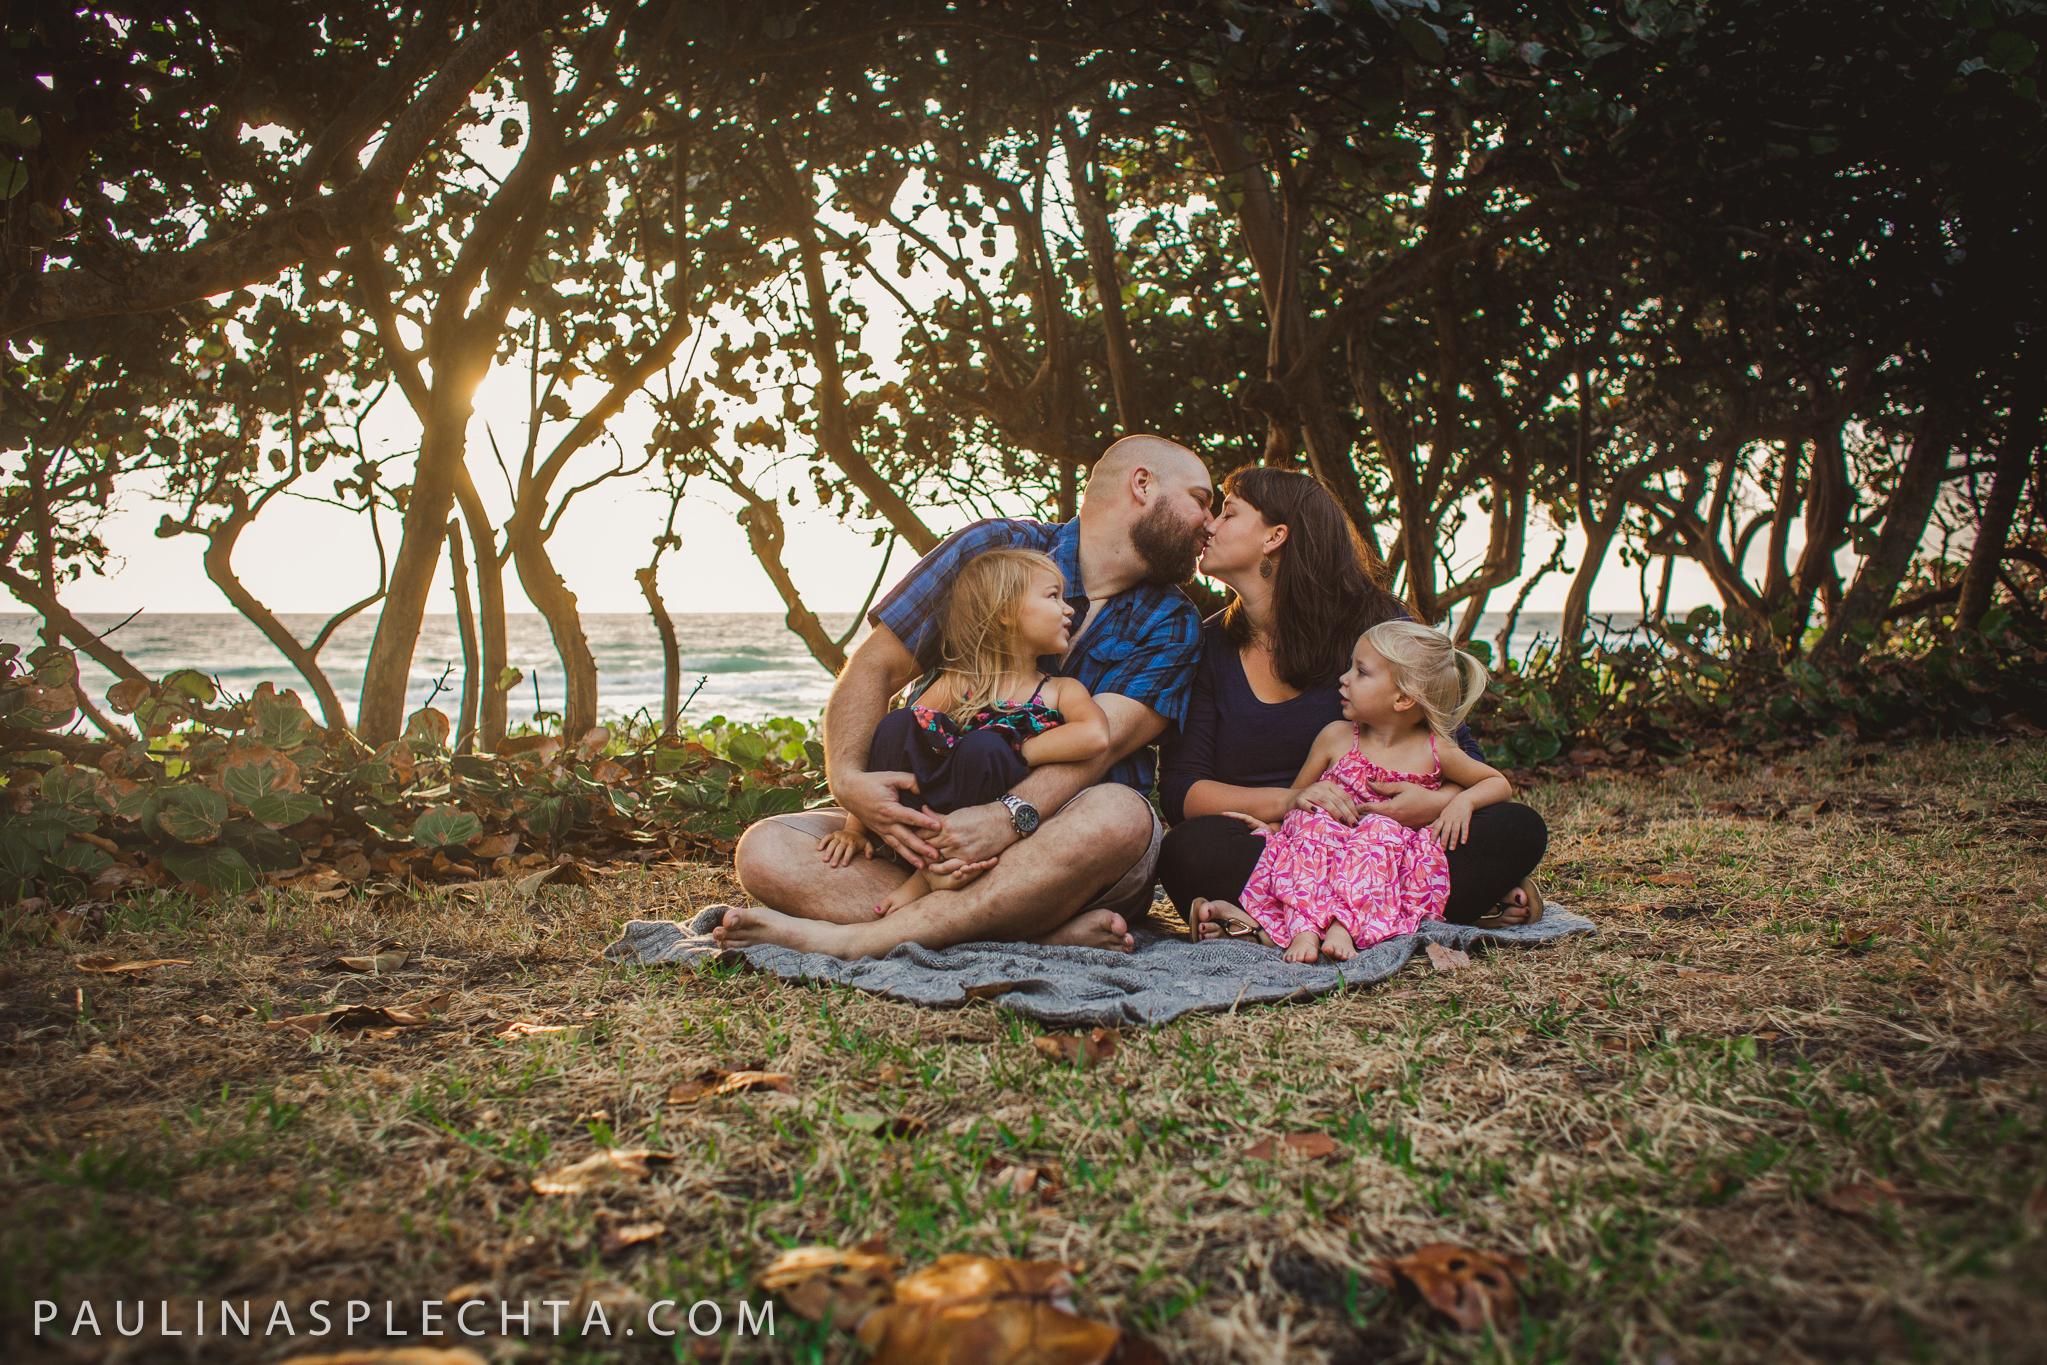 Family Photographer South Florida Pompano Broward Palm Beach Babies Baby Newborn Breastfeeding Birth Photograpy Beach Home Documentary Session-87.jpg